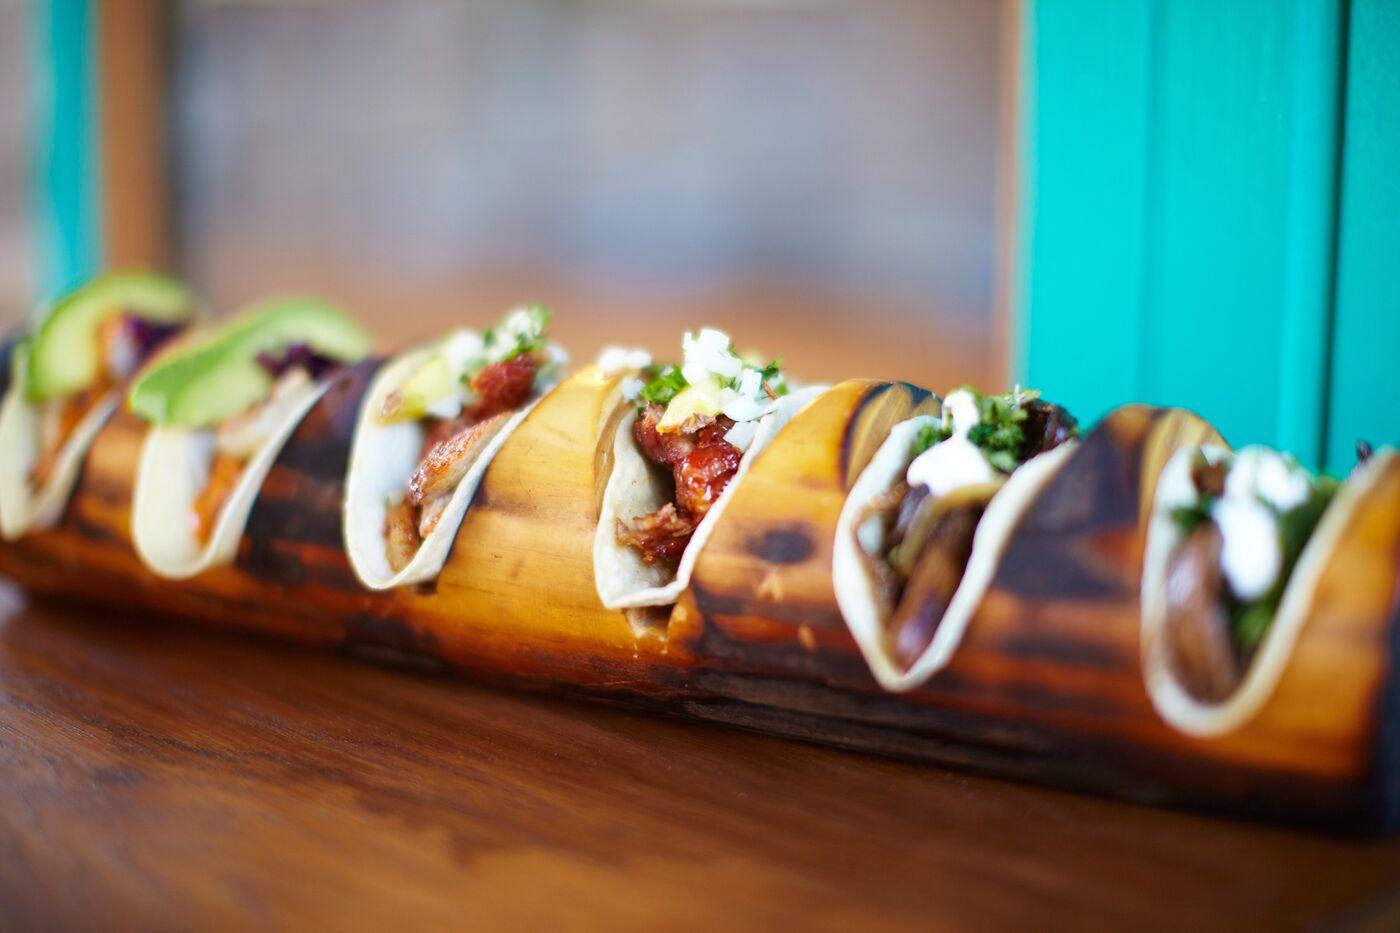 La Bodega Negra Cafe's selection of tacos.